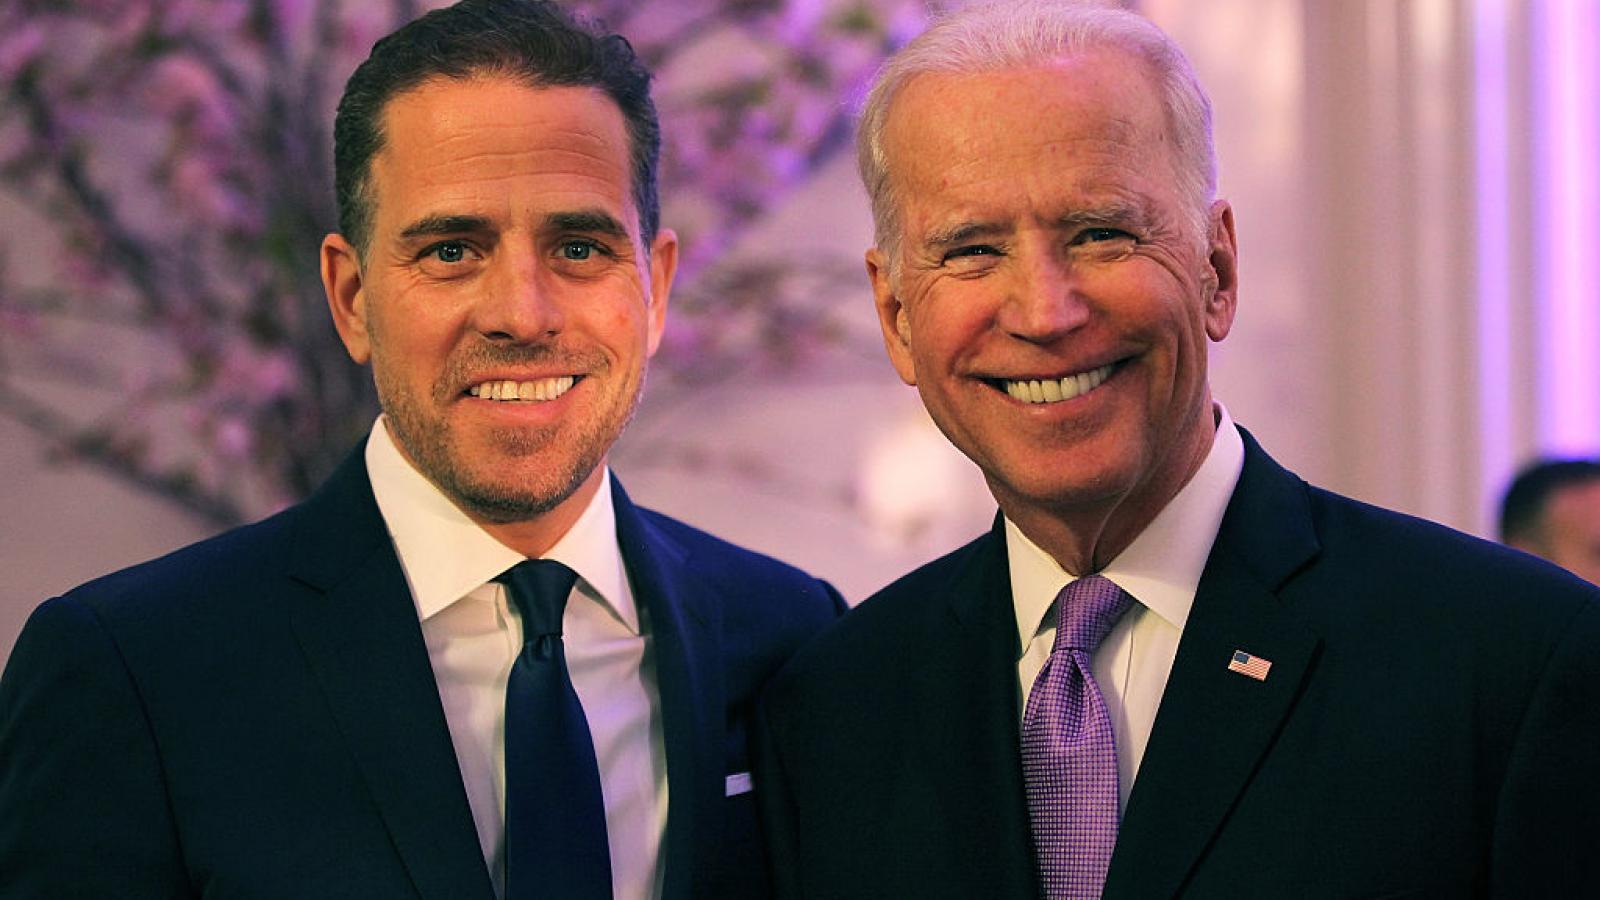 Hunter Biden with father Joe Biden